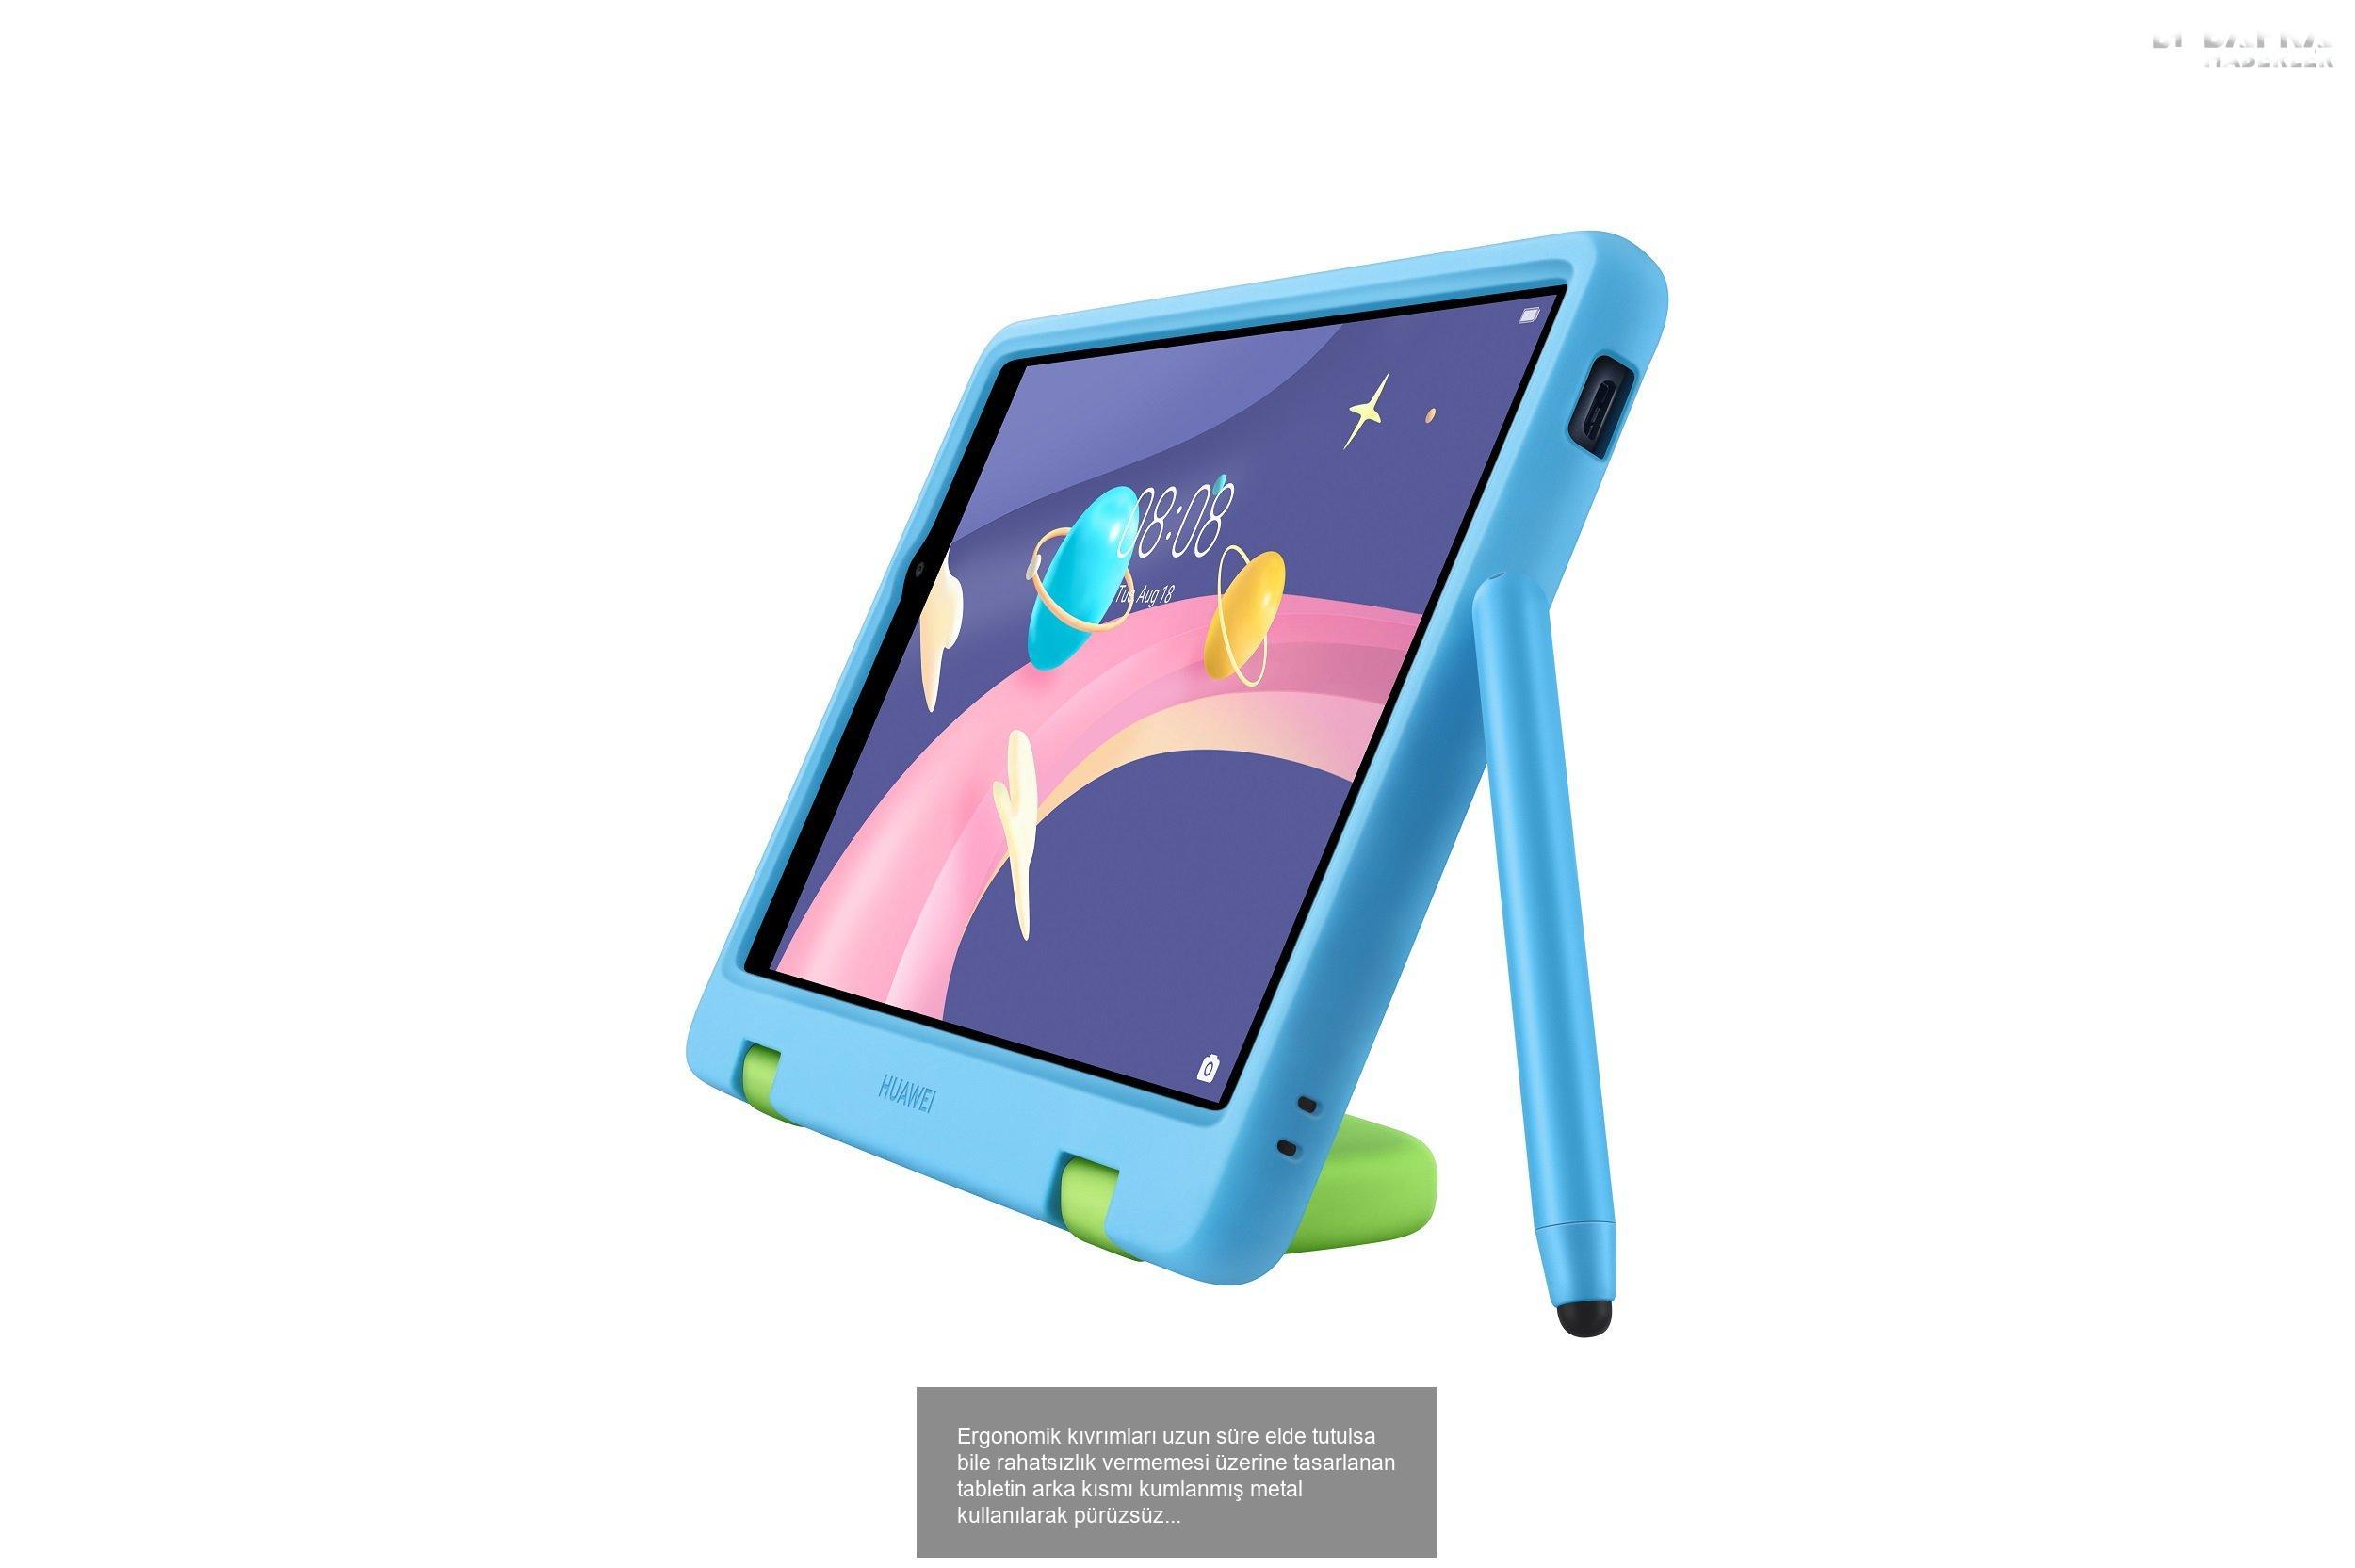 huawei matepad t8 kids edition, huawei online mağaza'da satışa sunuldu 6